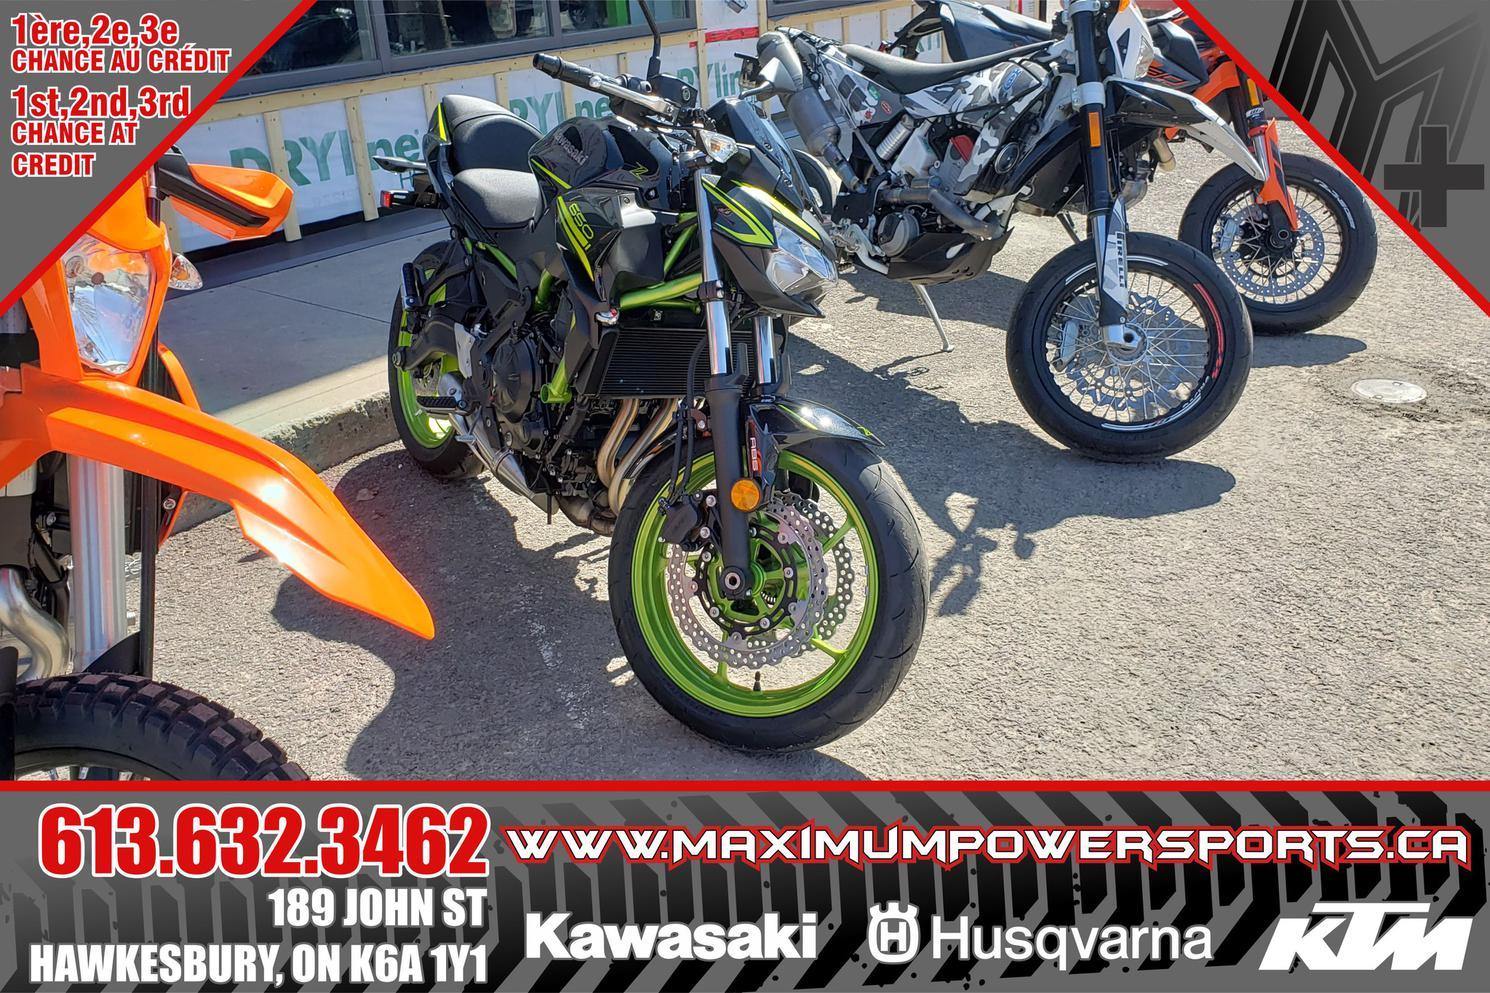 2021 Kawasaki Z650 ABS SE Z650 ABS SE